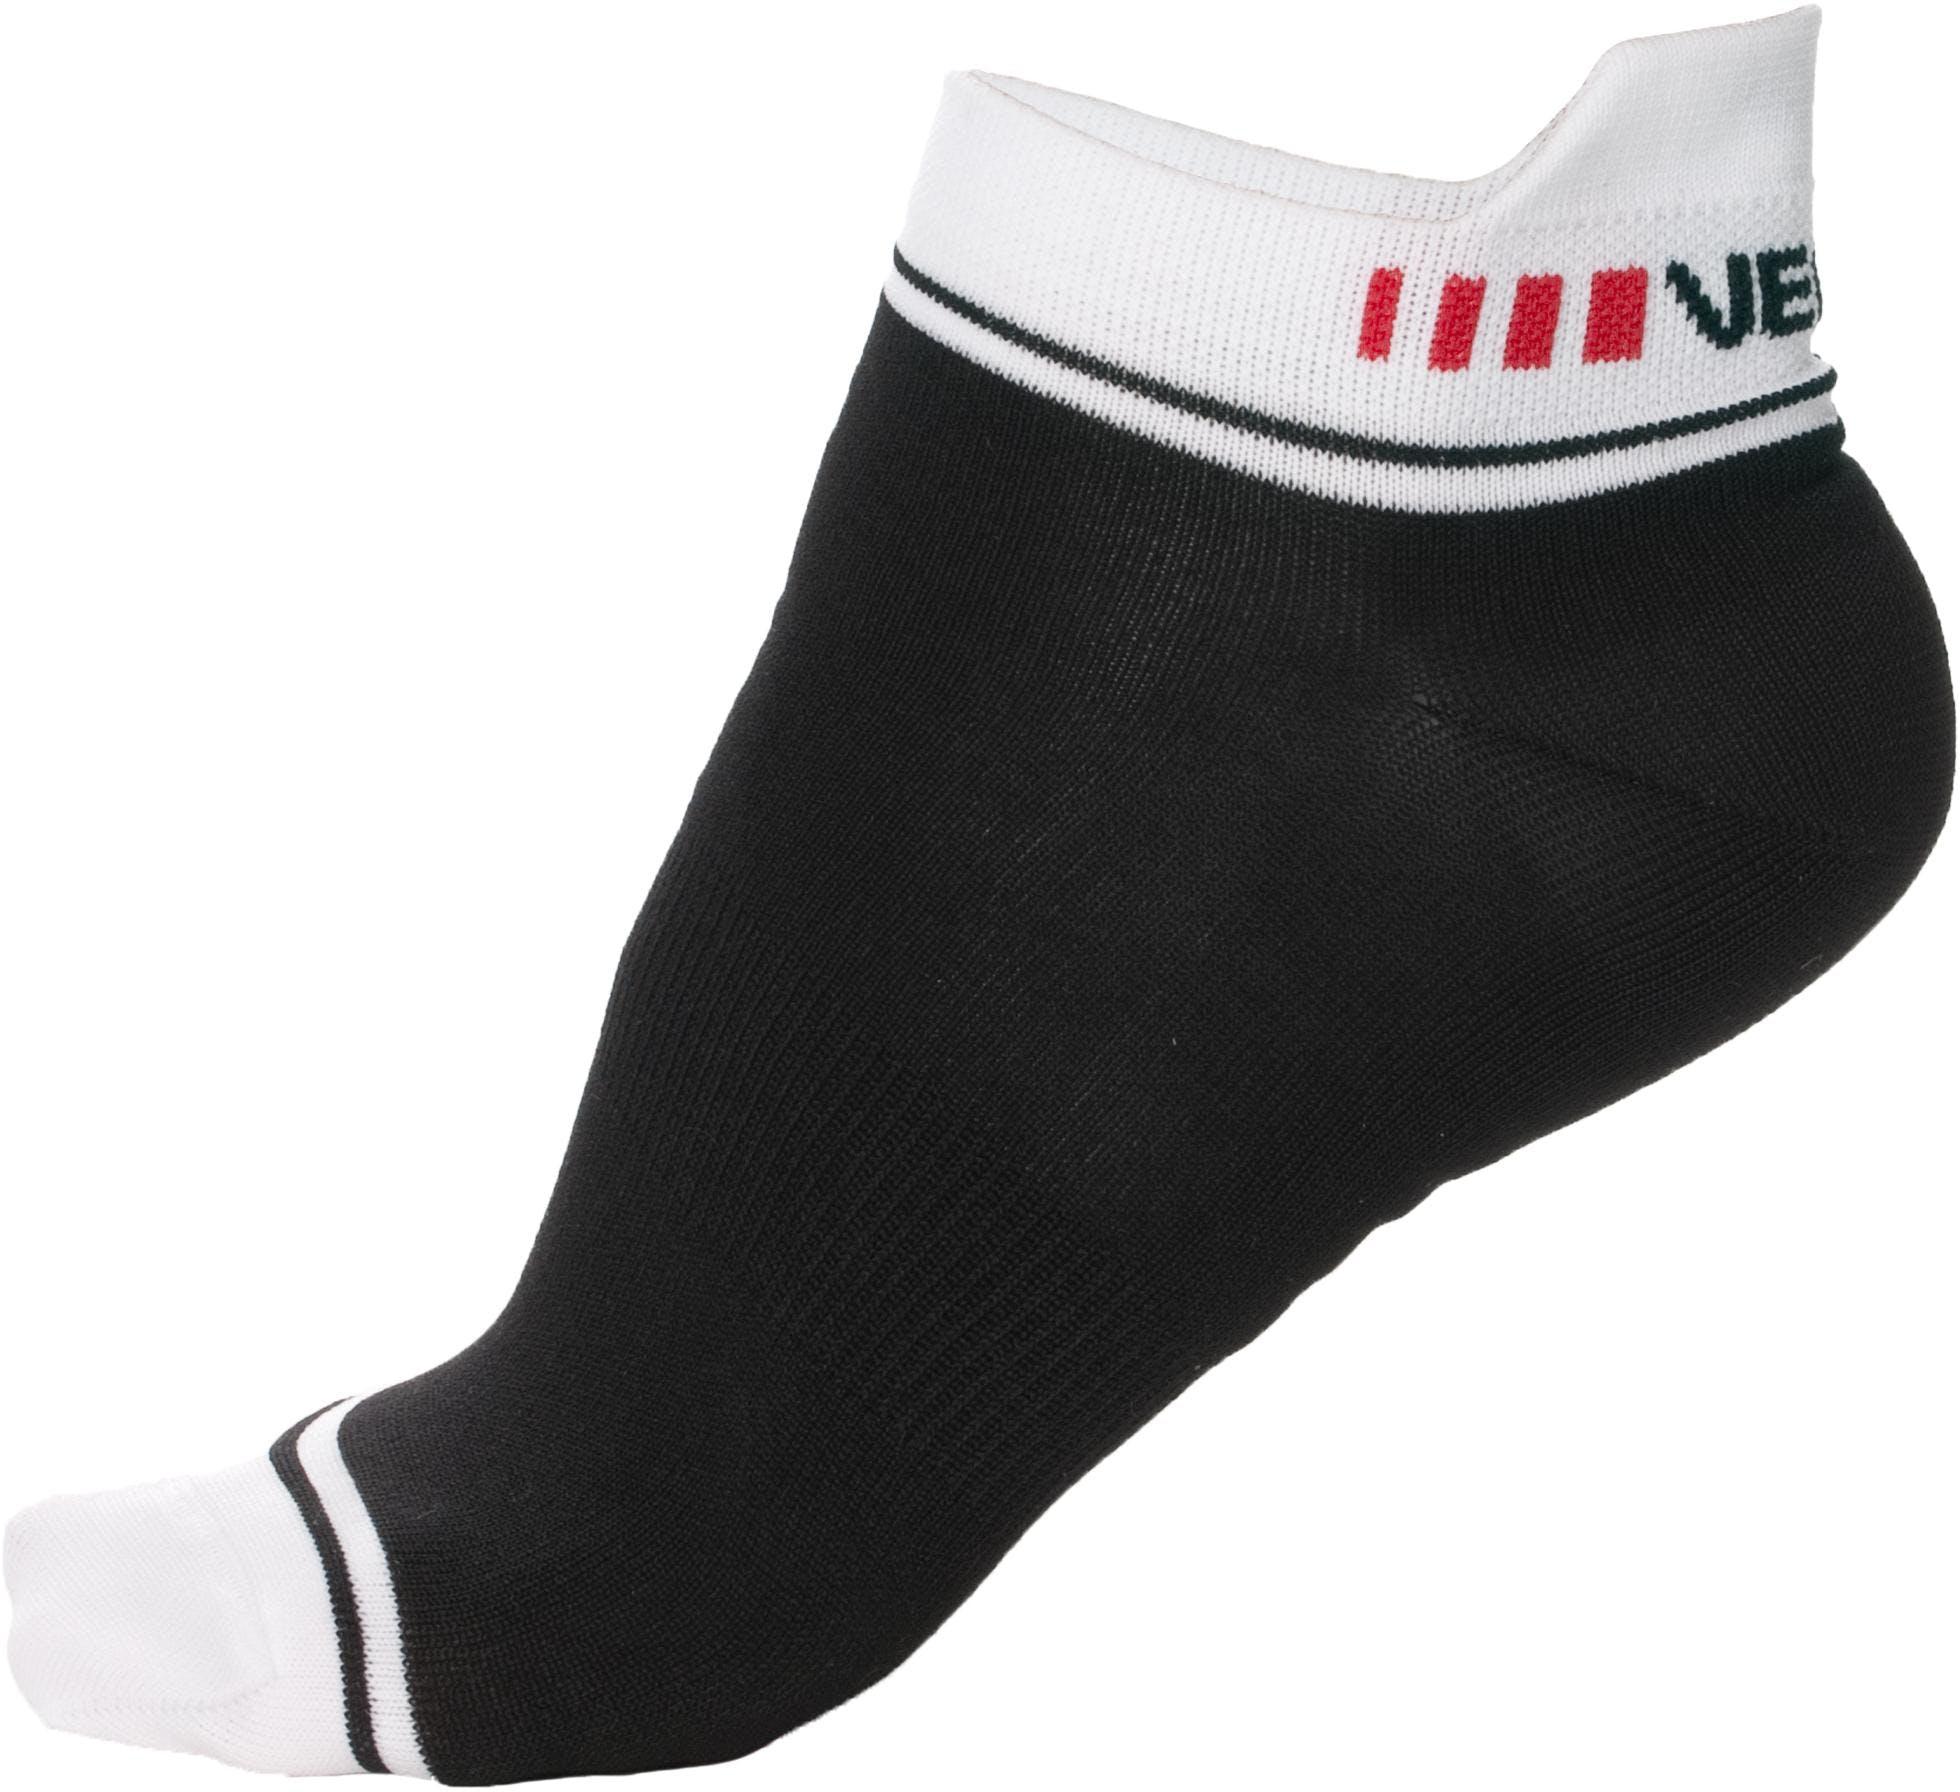 Socks Lady Black